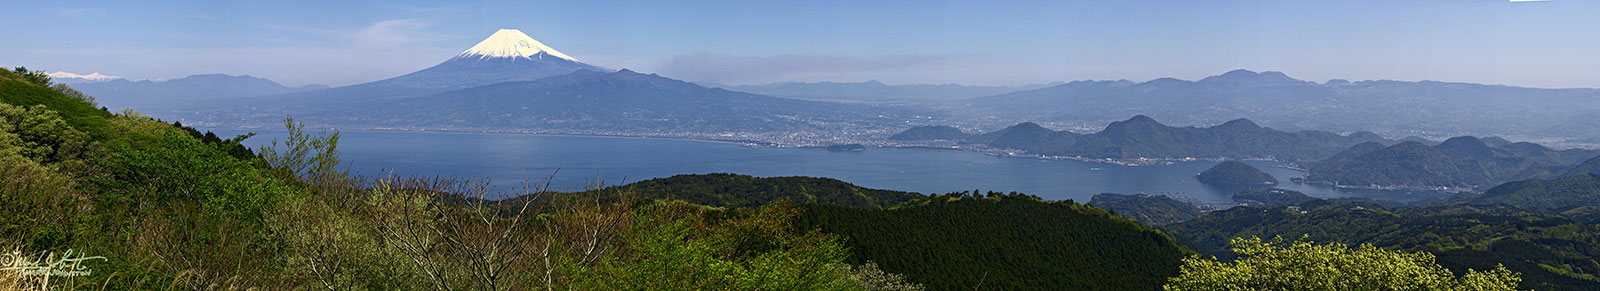 Mt. Fuji and the city of Numazu from the spine of the Izu Peninsula.